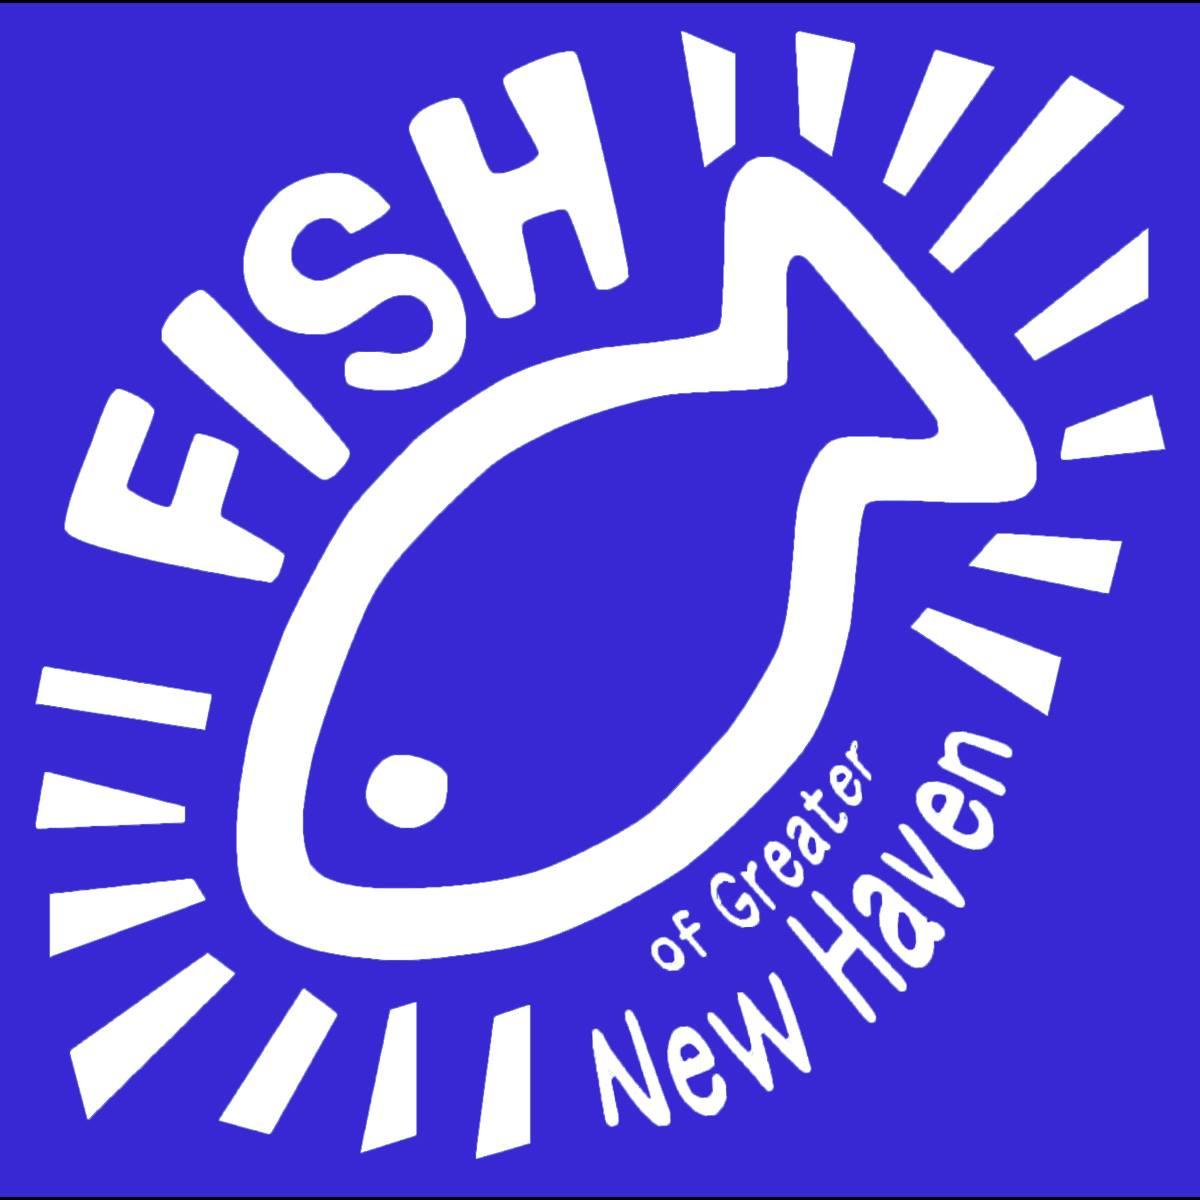 Fish of Greater New Haven - St Brendan's School